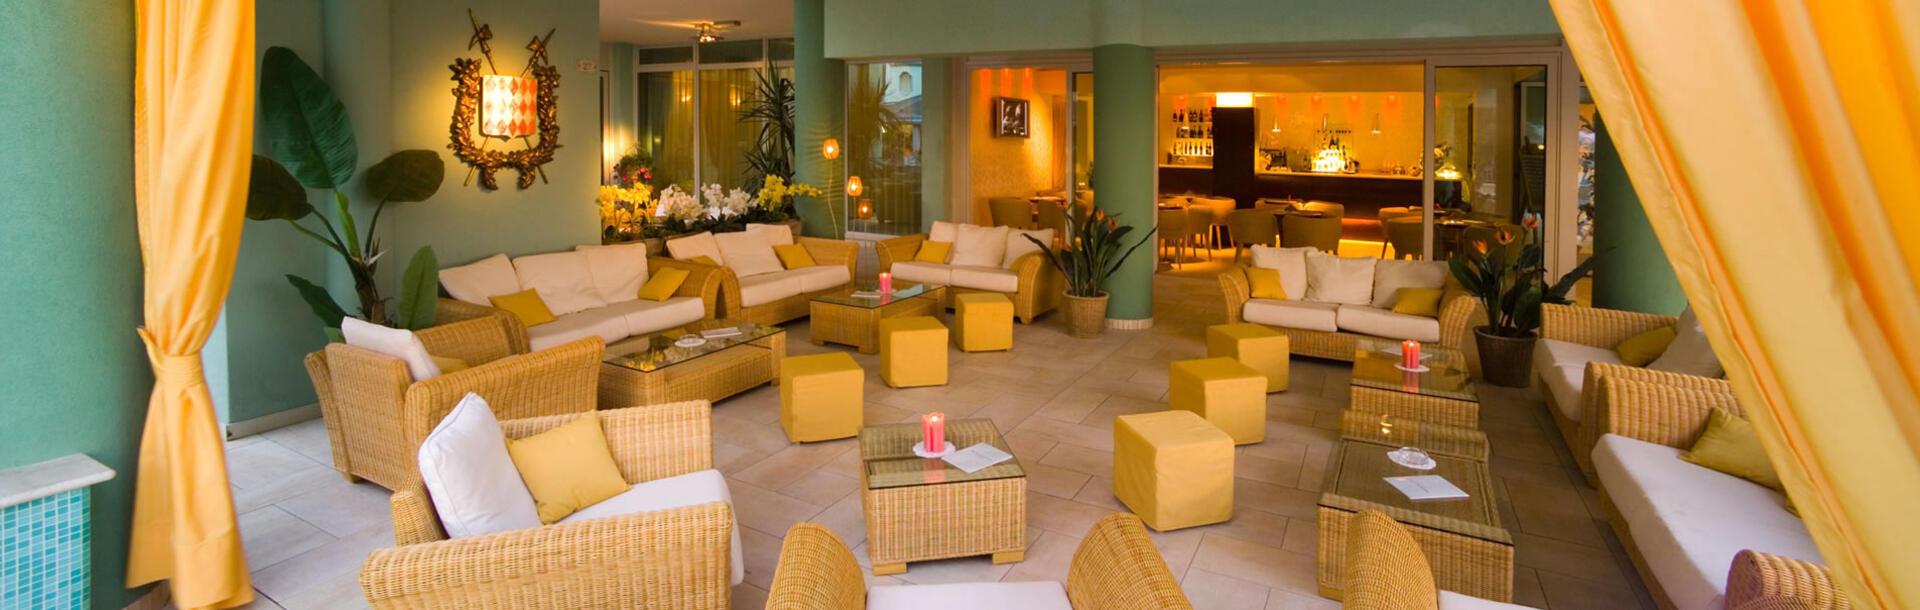 hotel-montecarlo it videogallery 014